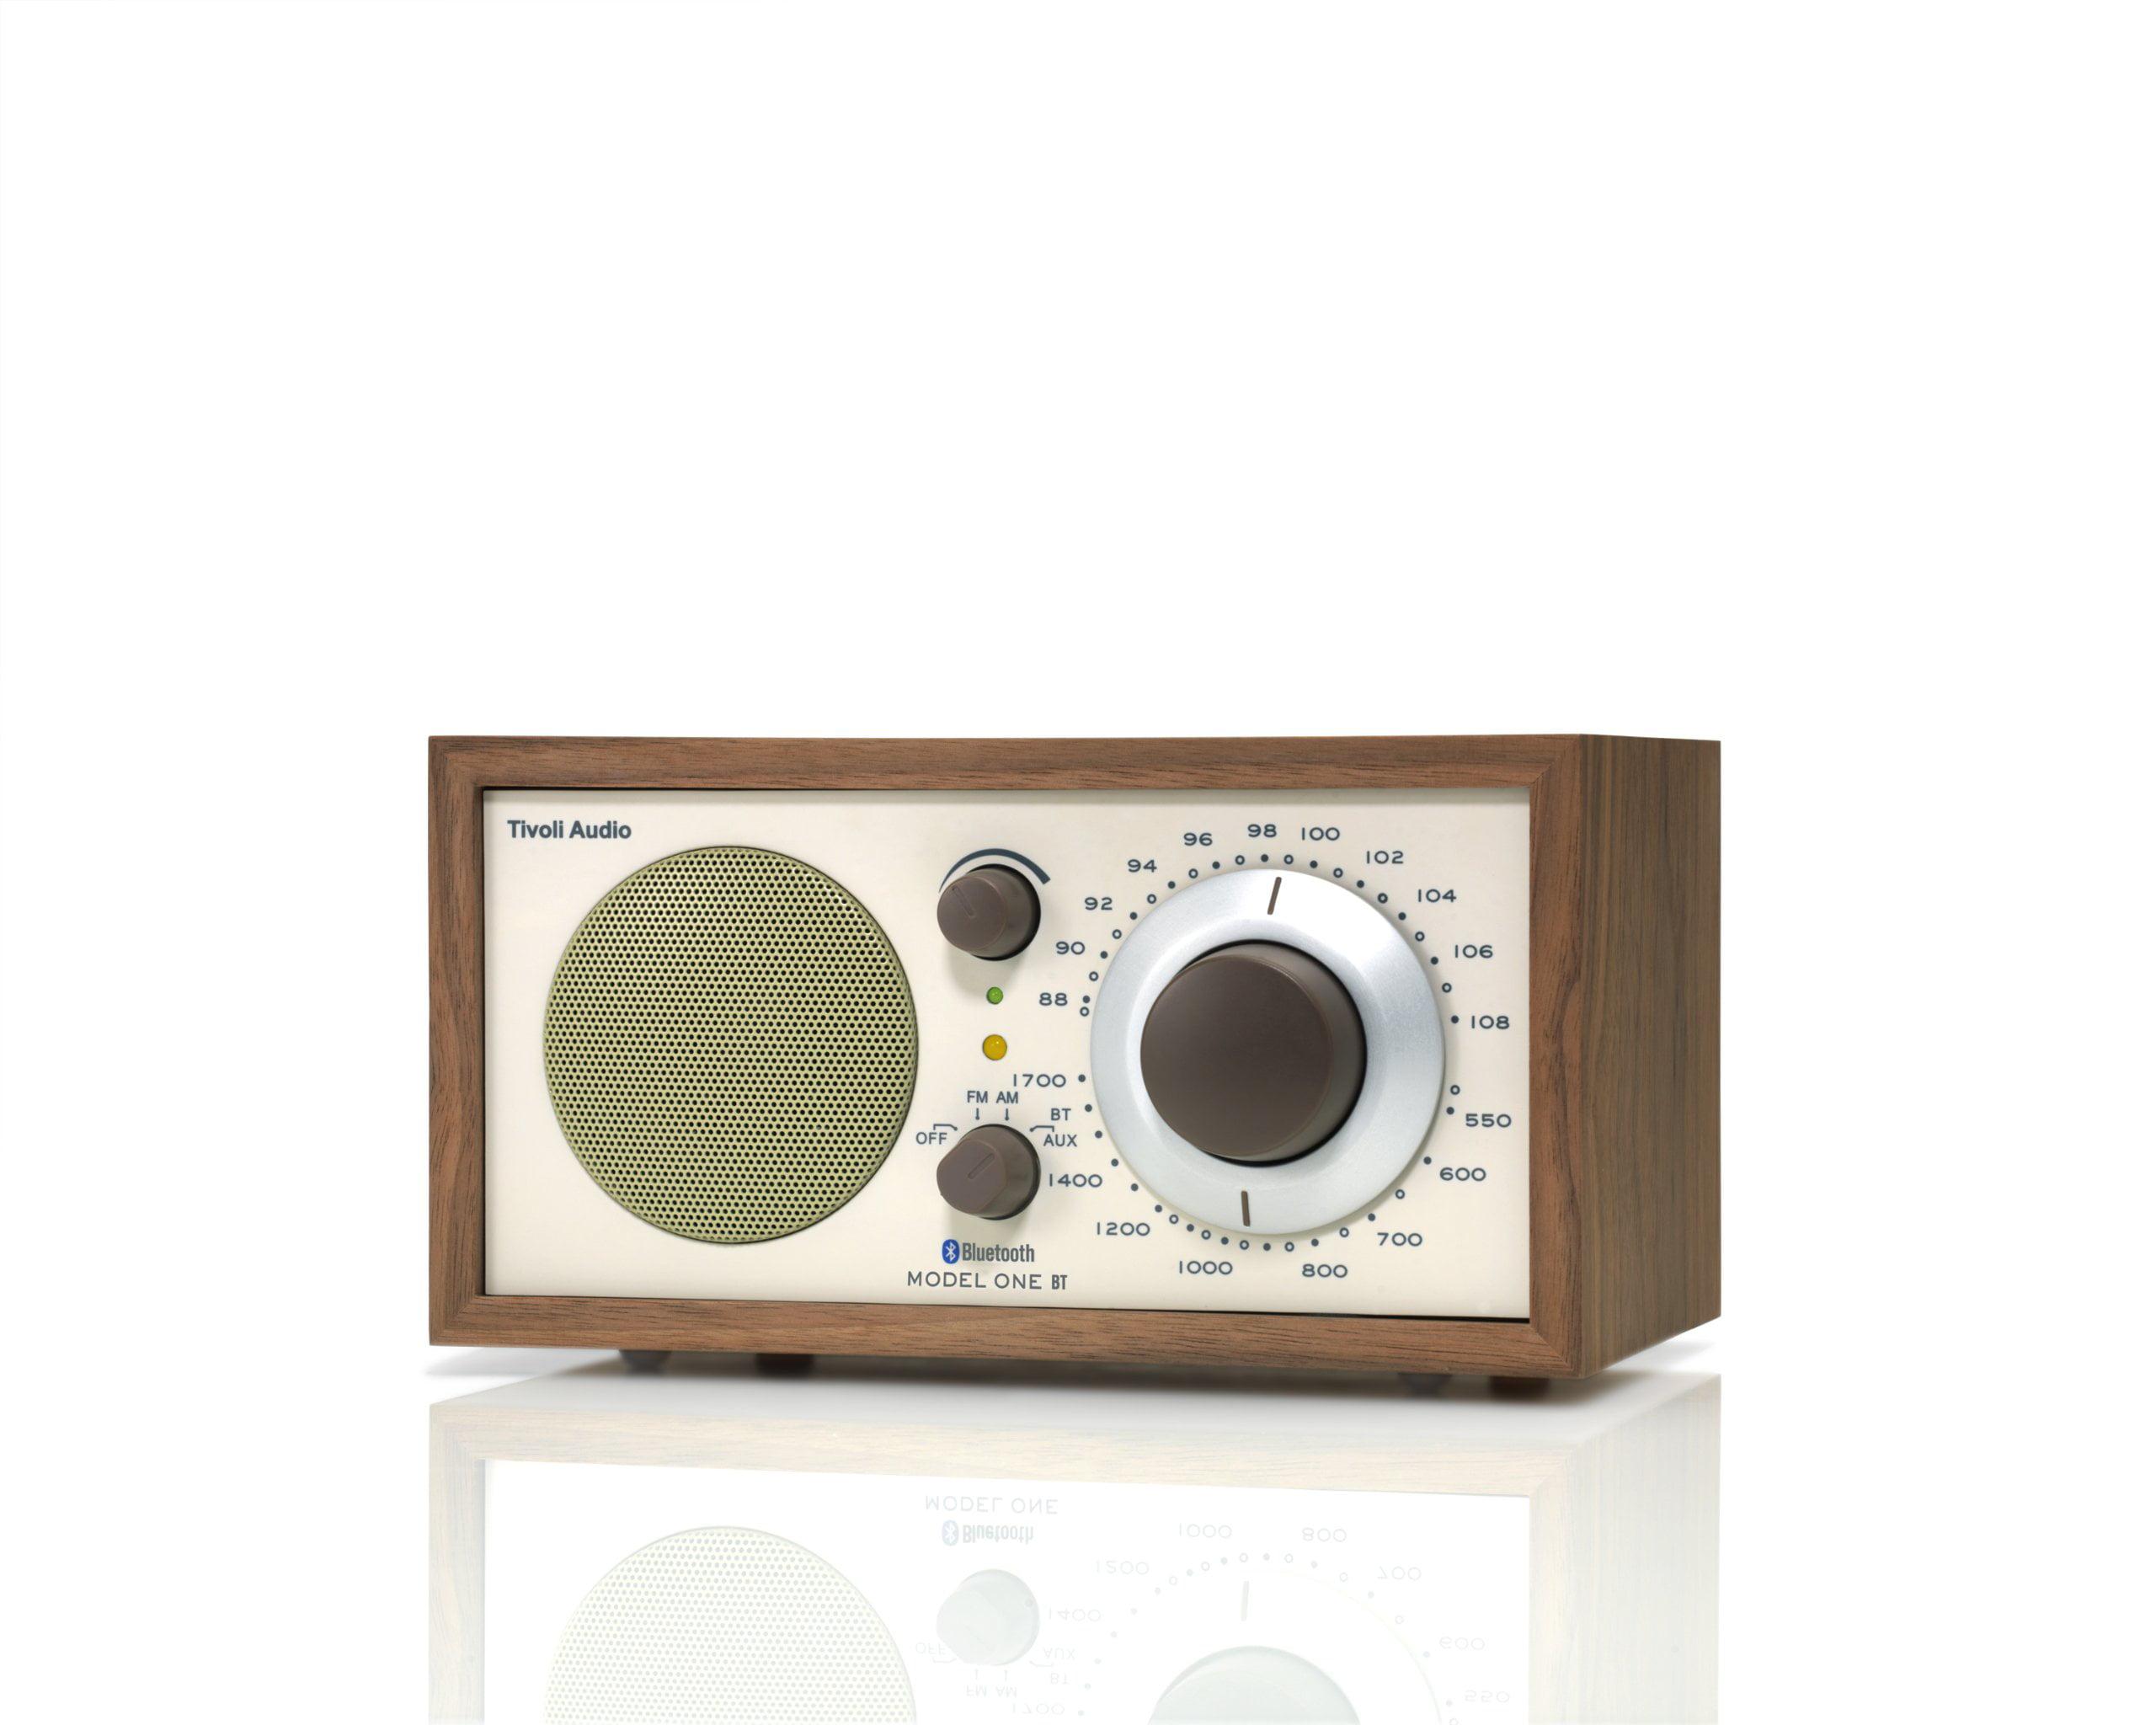 Tivoli Audio Llc M1btcla Fm am Reception, Bluetooth Streaming ,auxiliary Input-walnut Beige by OWC